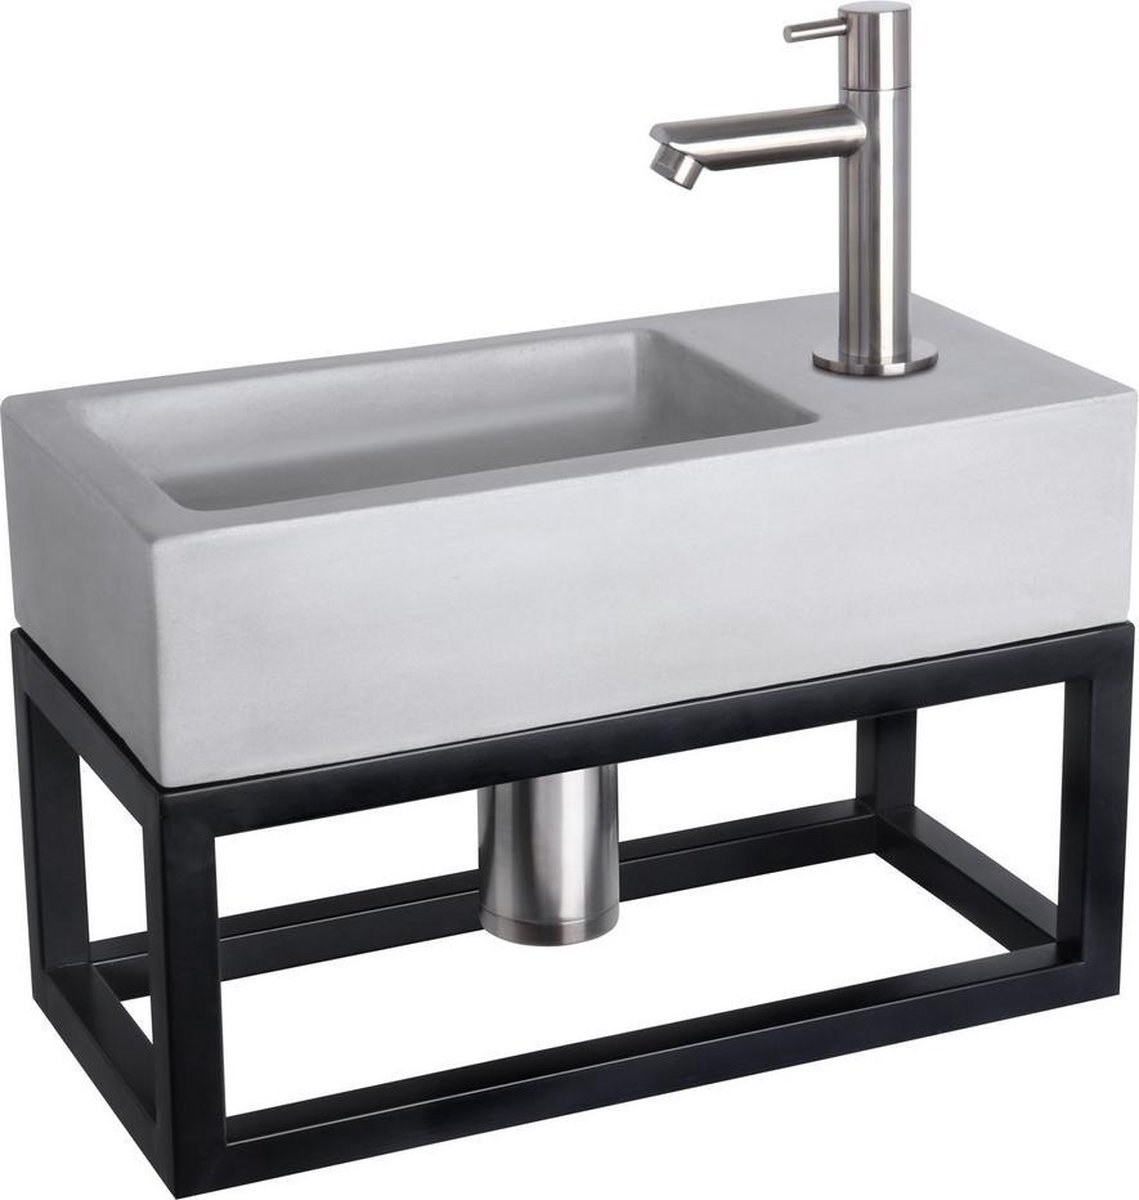 Differnz Ravo Fonteinset - Beton lichtgrijs - Kraan recht mat chroom - Met handdoekrek - 38.5 x 18.5 x 9 cm